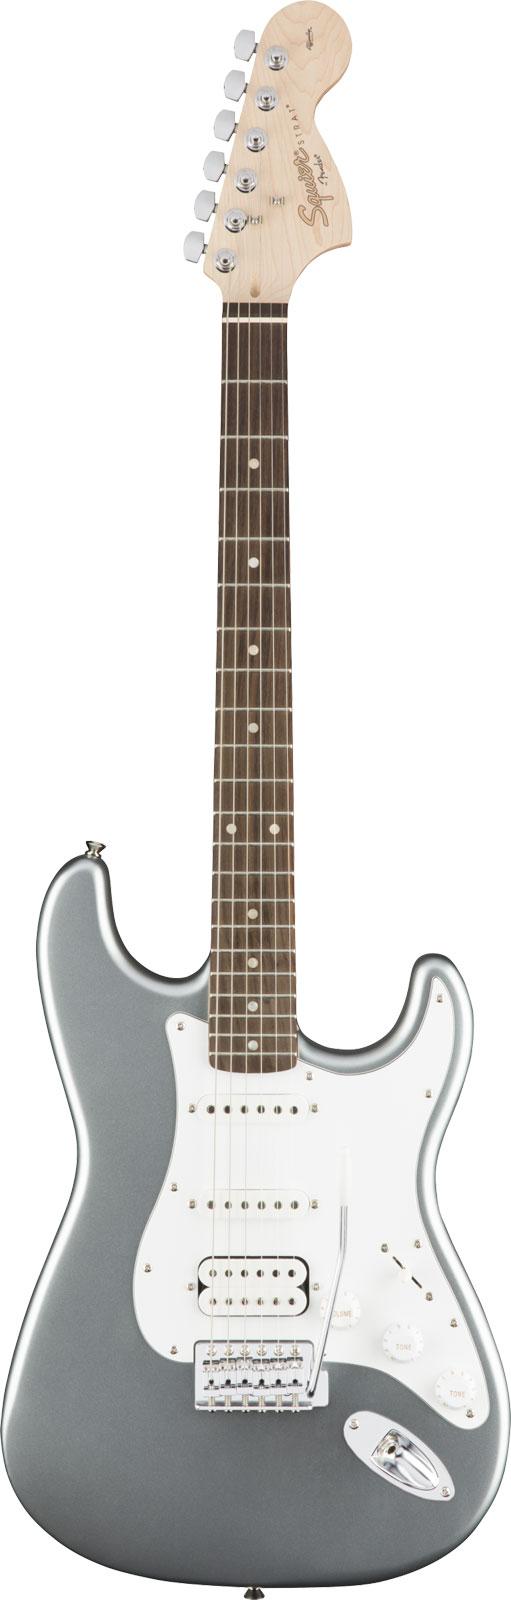 Squier By Fender Affinity Series Stratocaster Hss Laurel Fingerboard Slick Silver